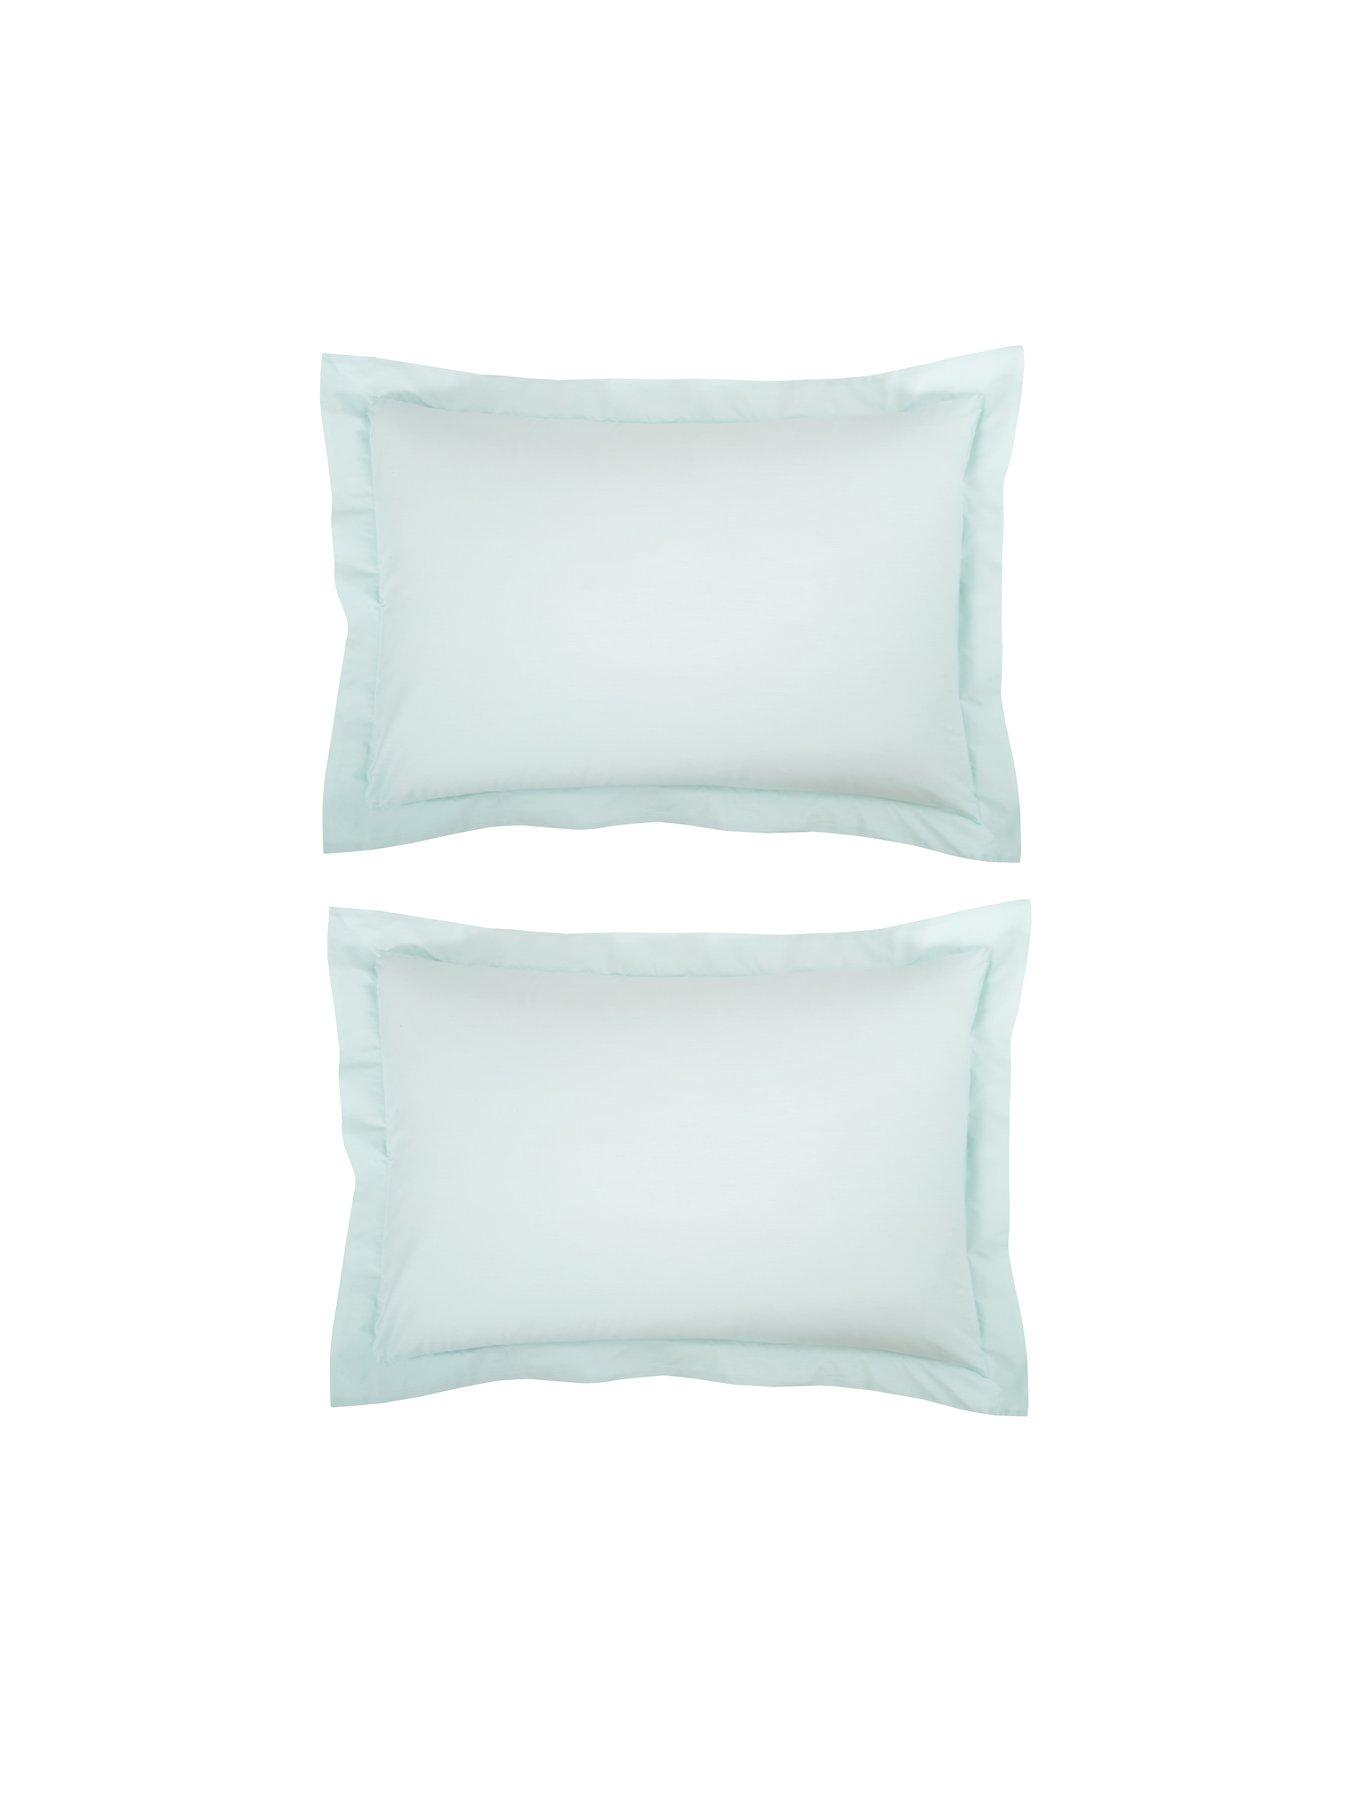 Pair Elite Textiles® Microfibre Housewife Pillow Cases Cream